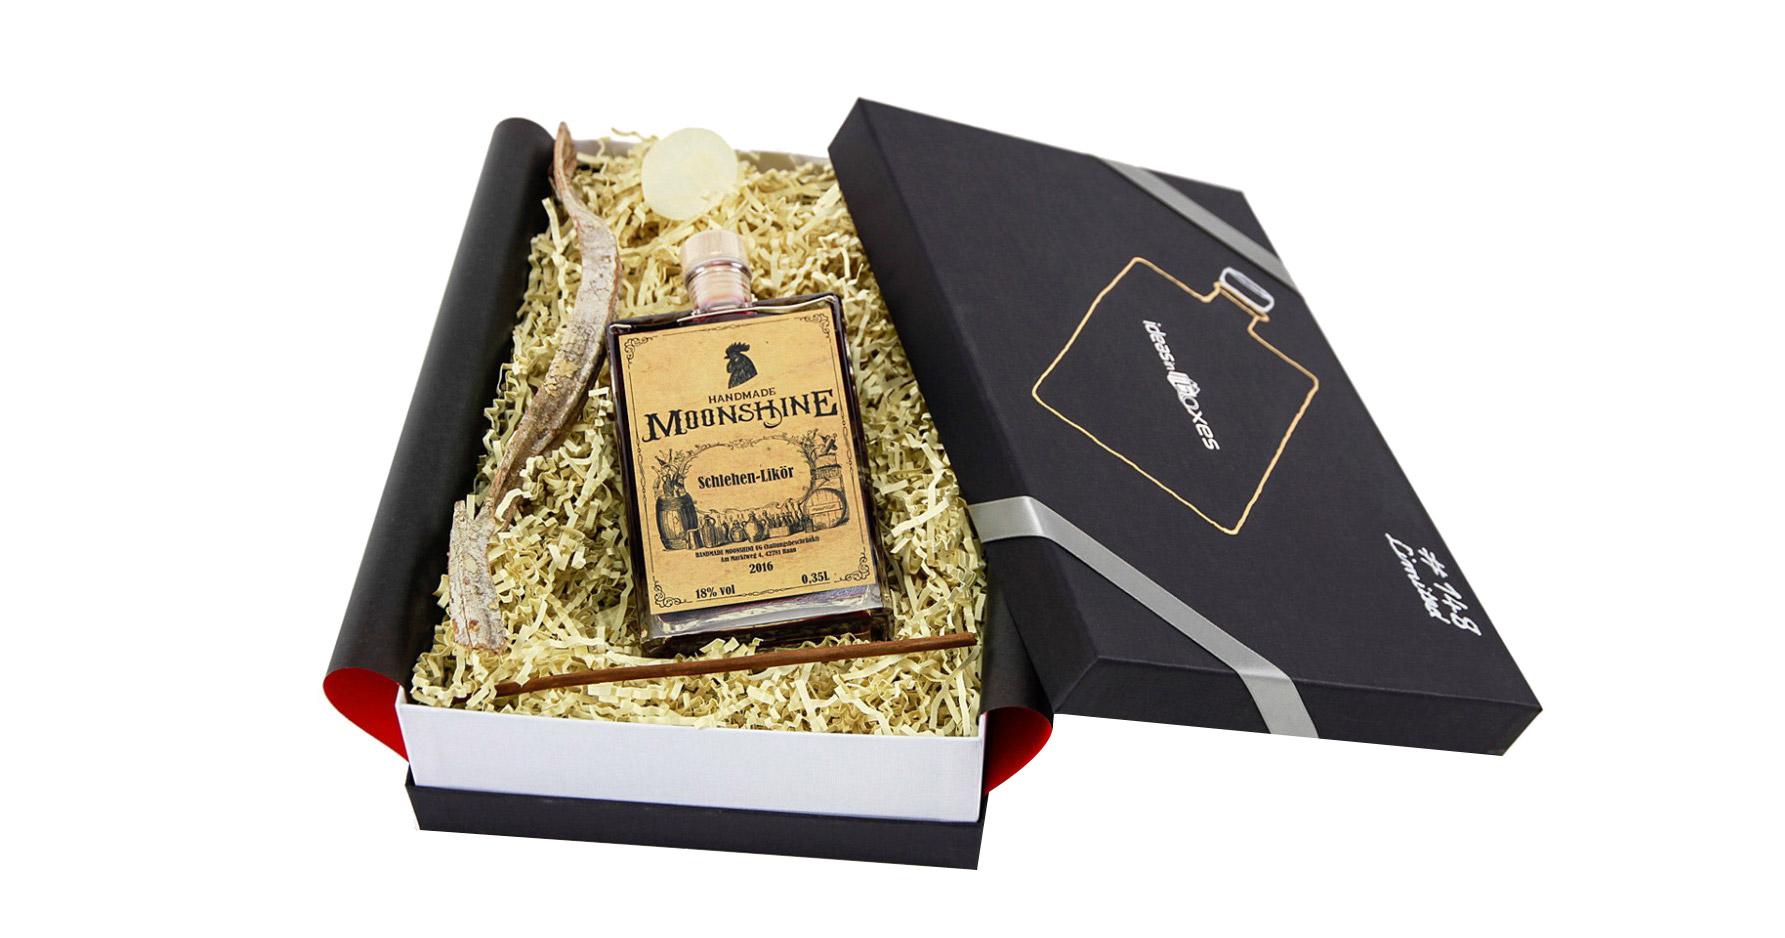 Handmade Moonshine – Handgemachte Liköre & Brände